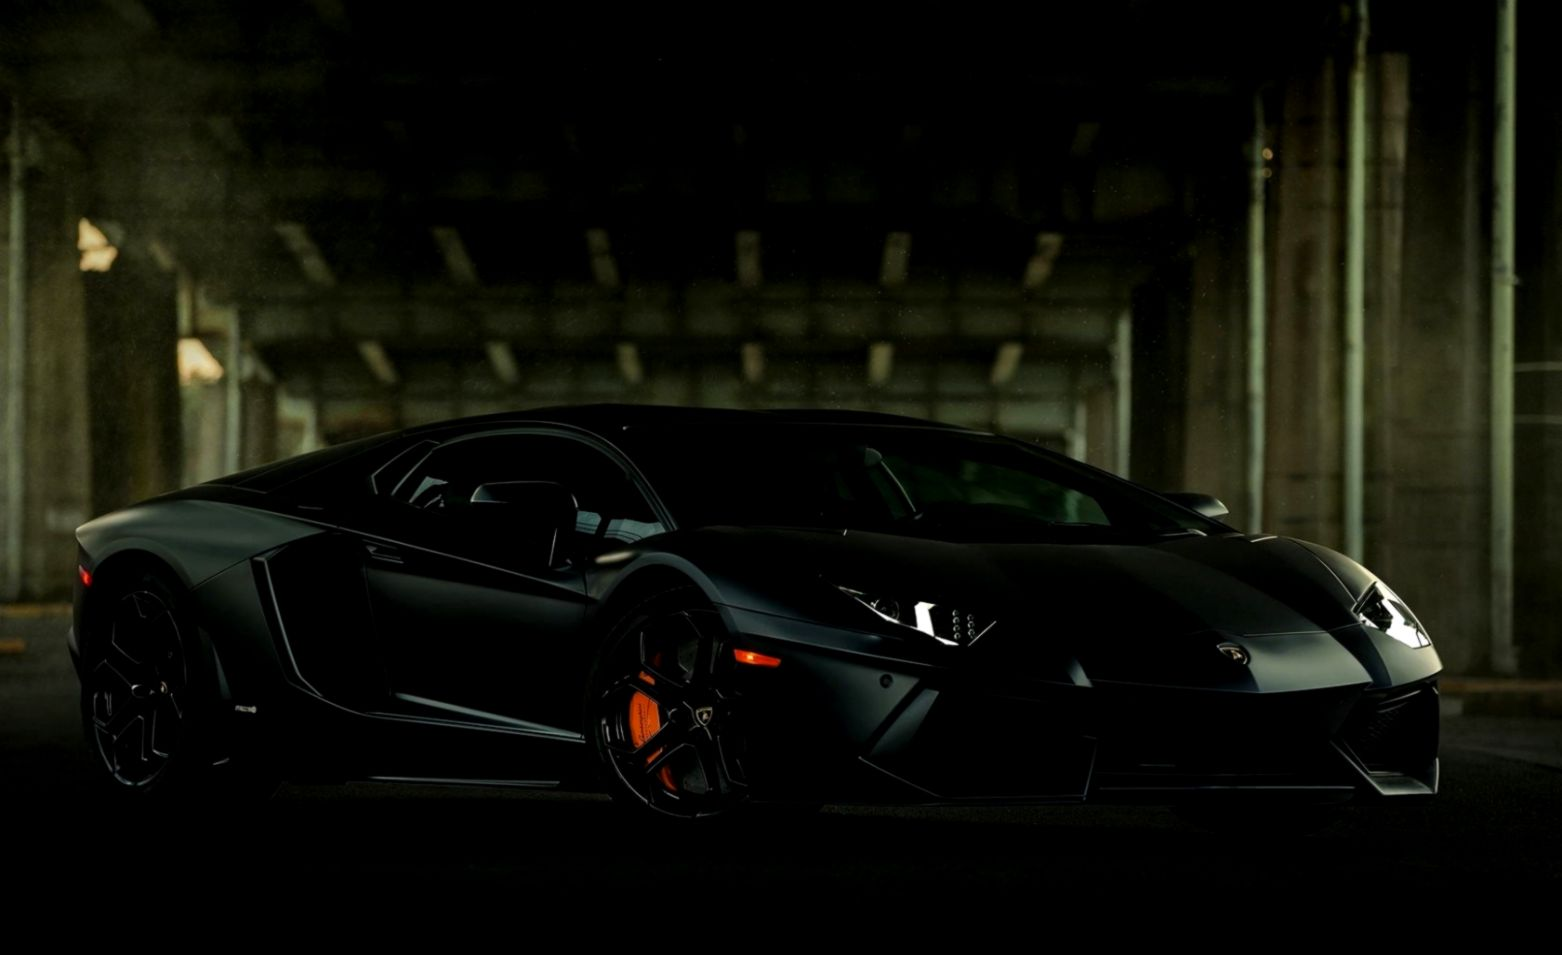 Lamborghini Aventador Black Car Wallpaper